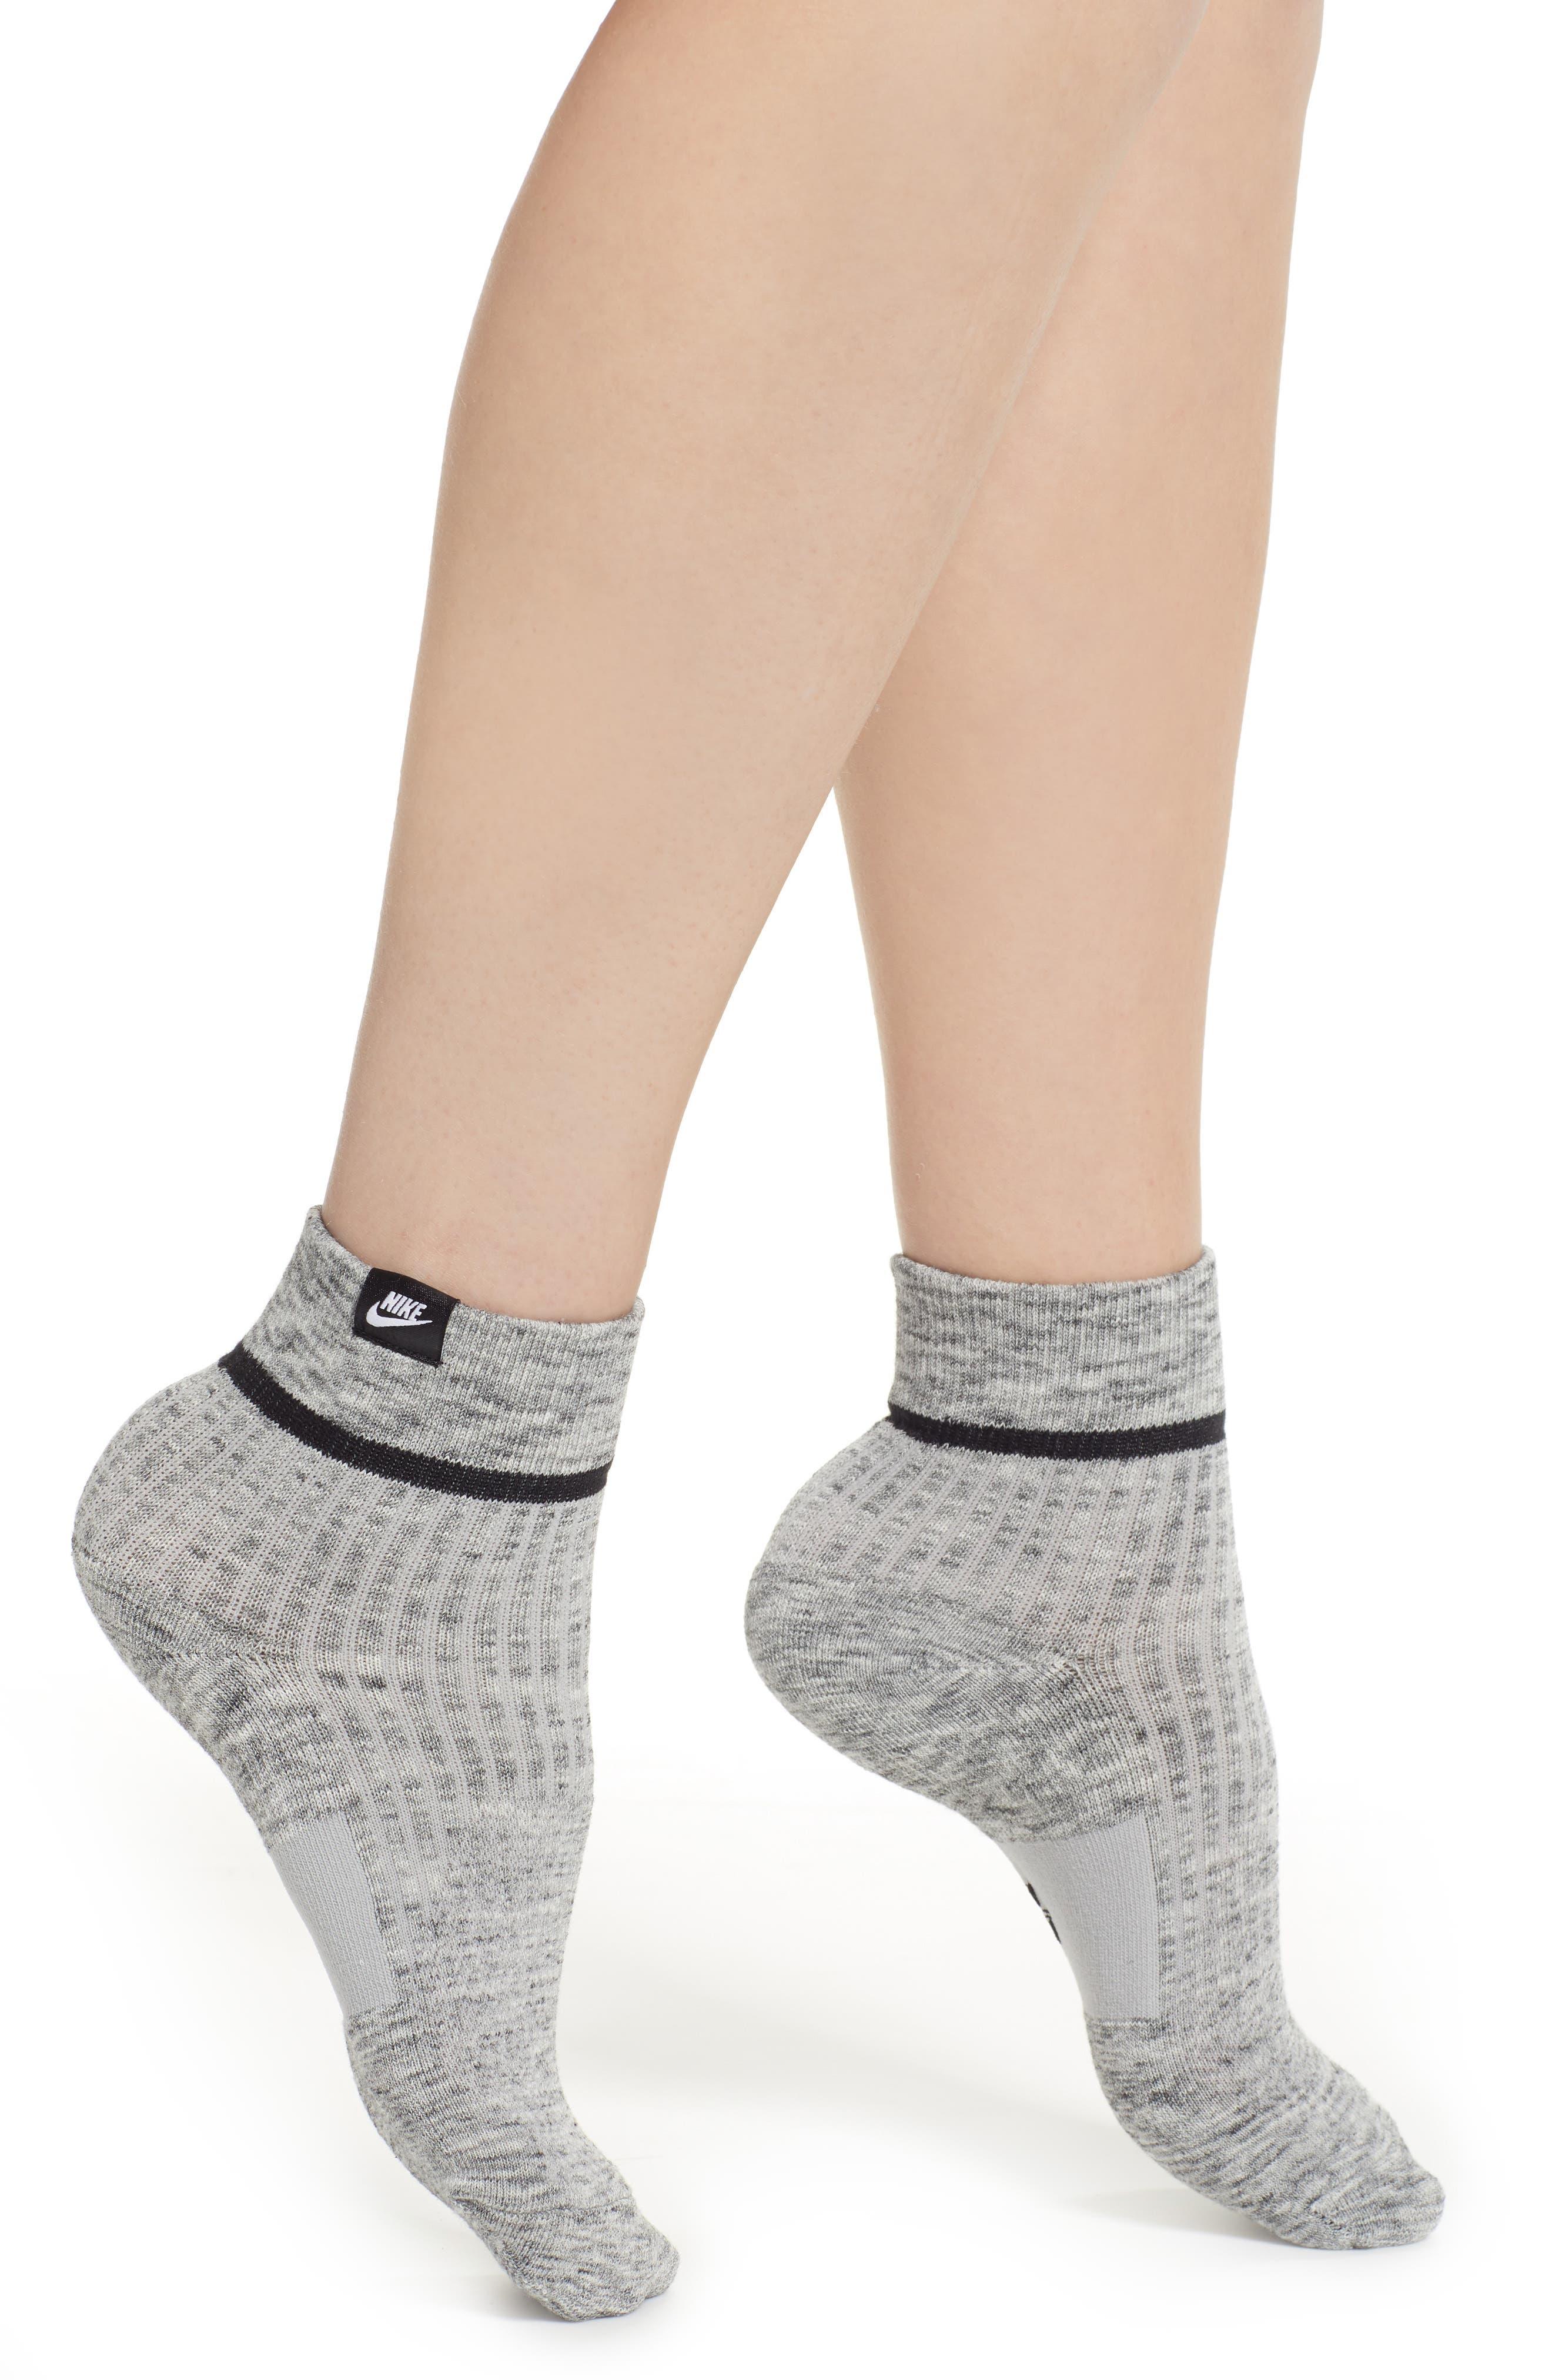 2-Pack SNKR Sox Essential Ankle Socks, Main, color, 020